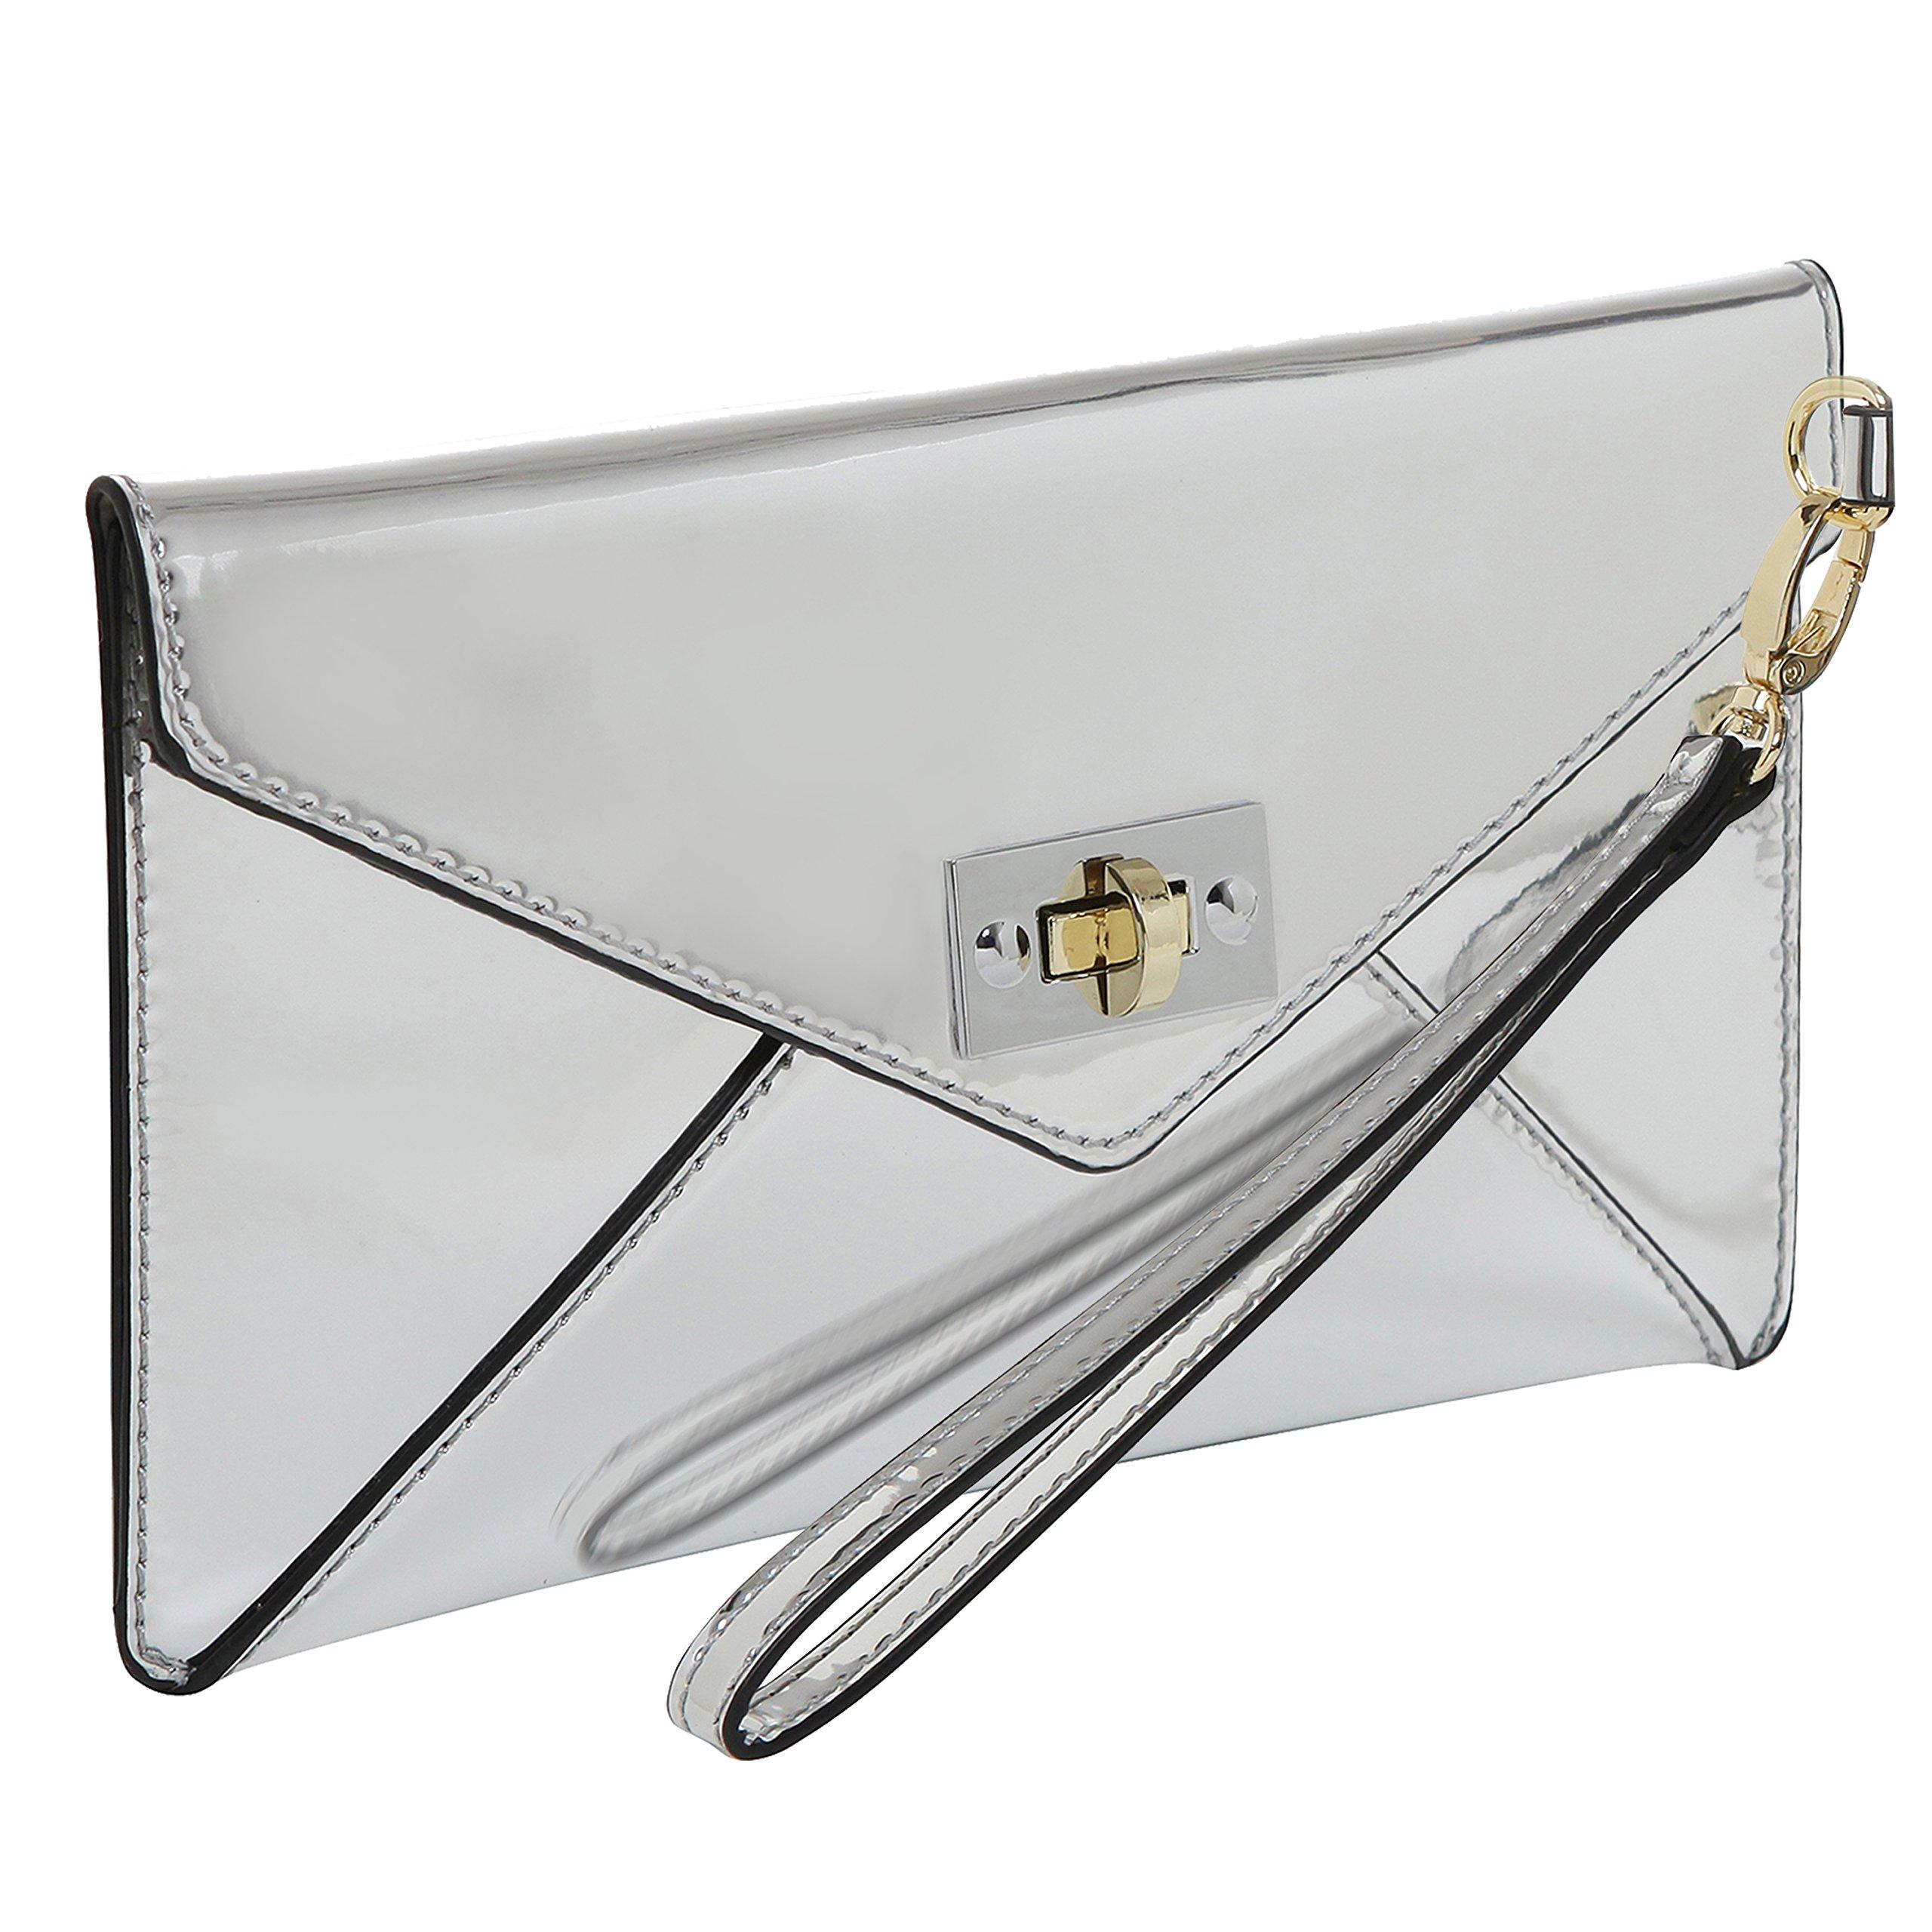 MG Collection Modern Mirror Silver Wristlet Clutch / Envelope Wallet Purse